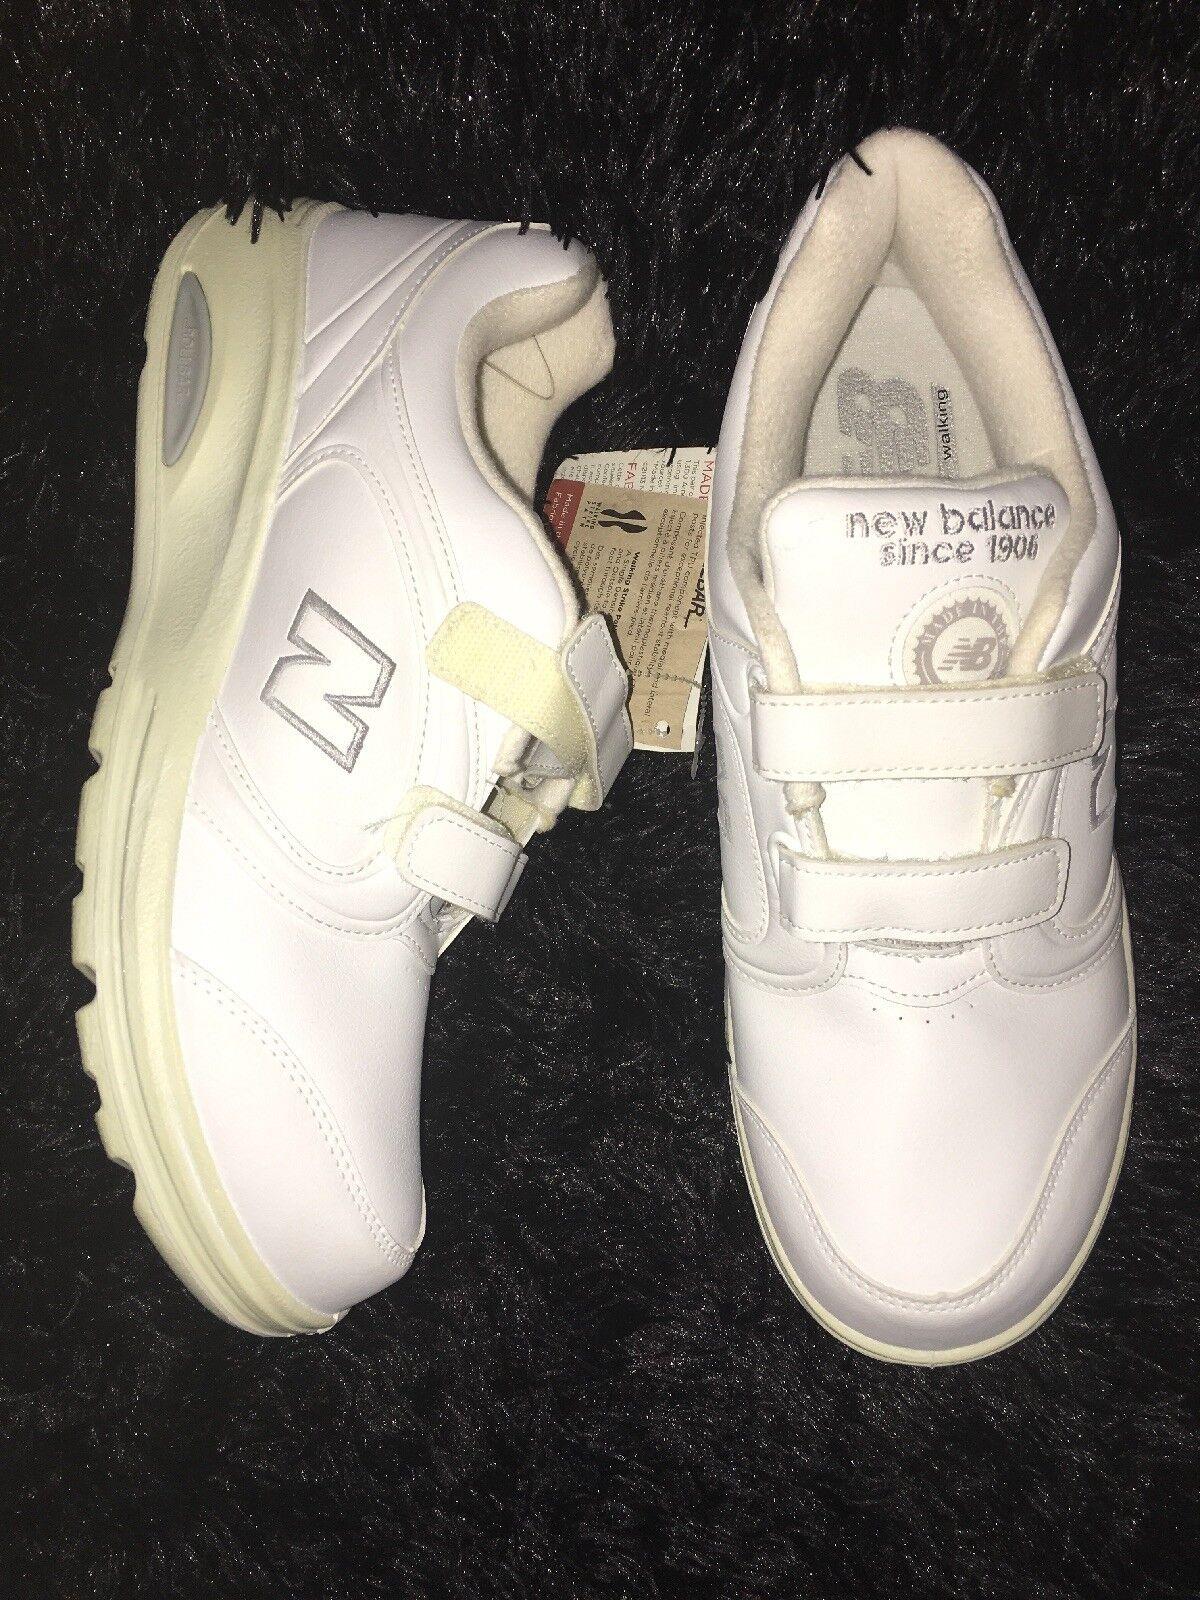 New Balance 812vw Women WW812vw Walking shoes sz 12 wide